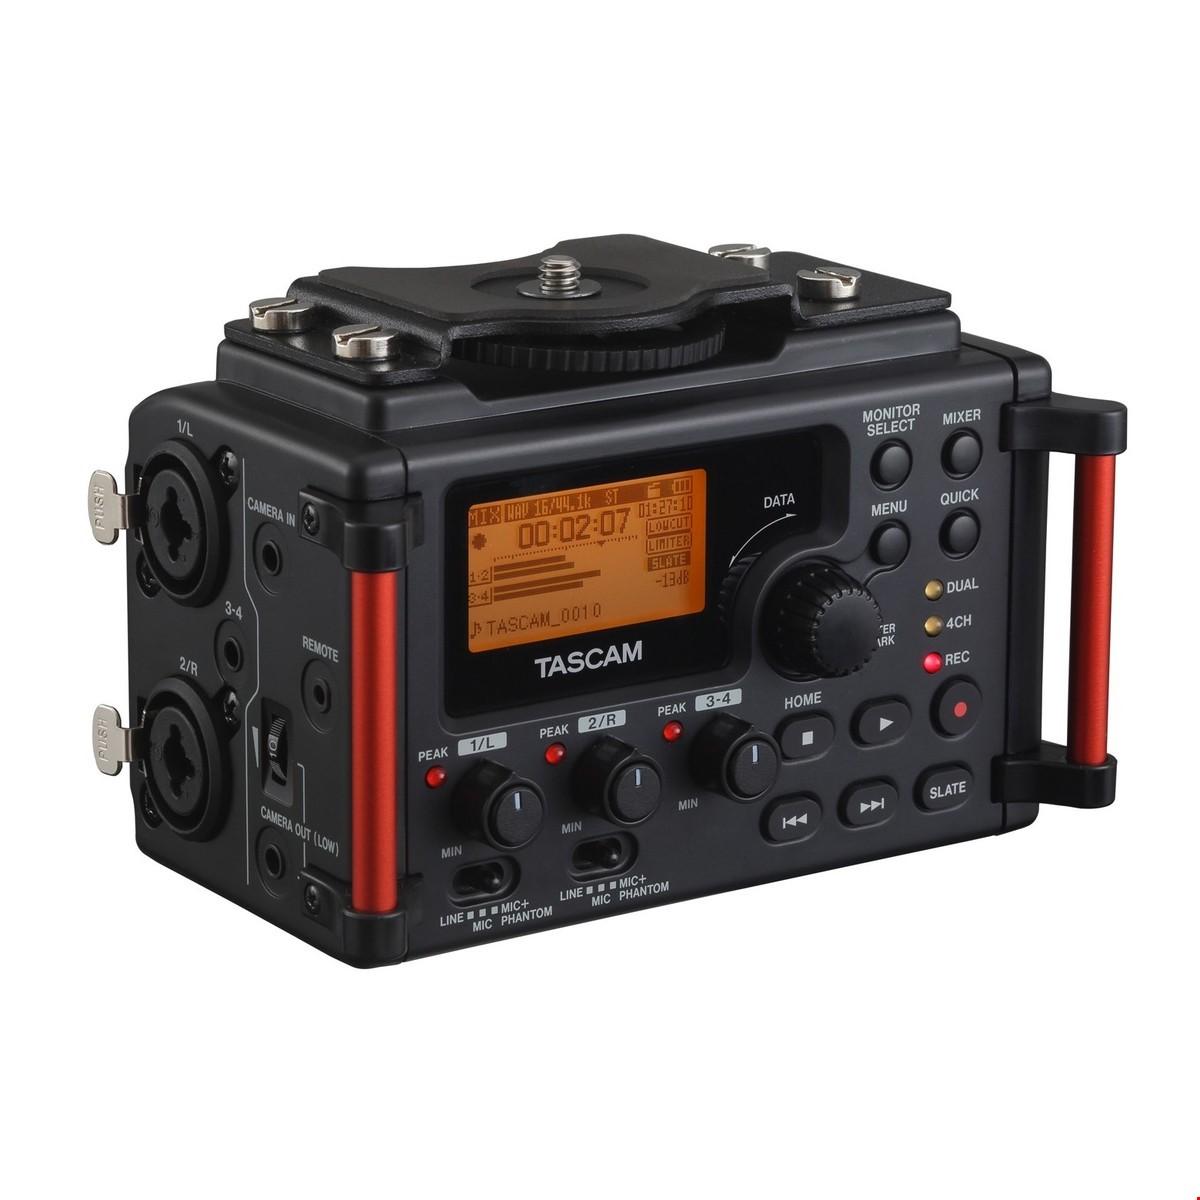 Tascam DR-60D MkII recorder